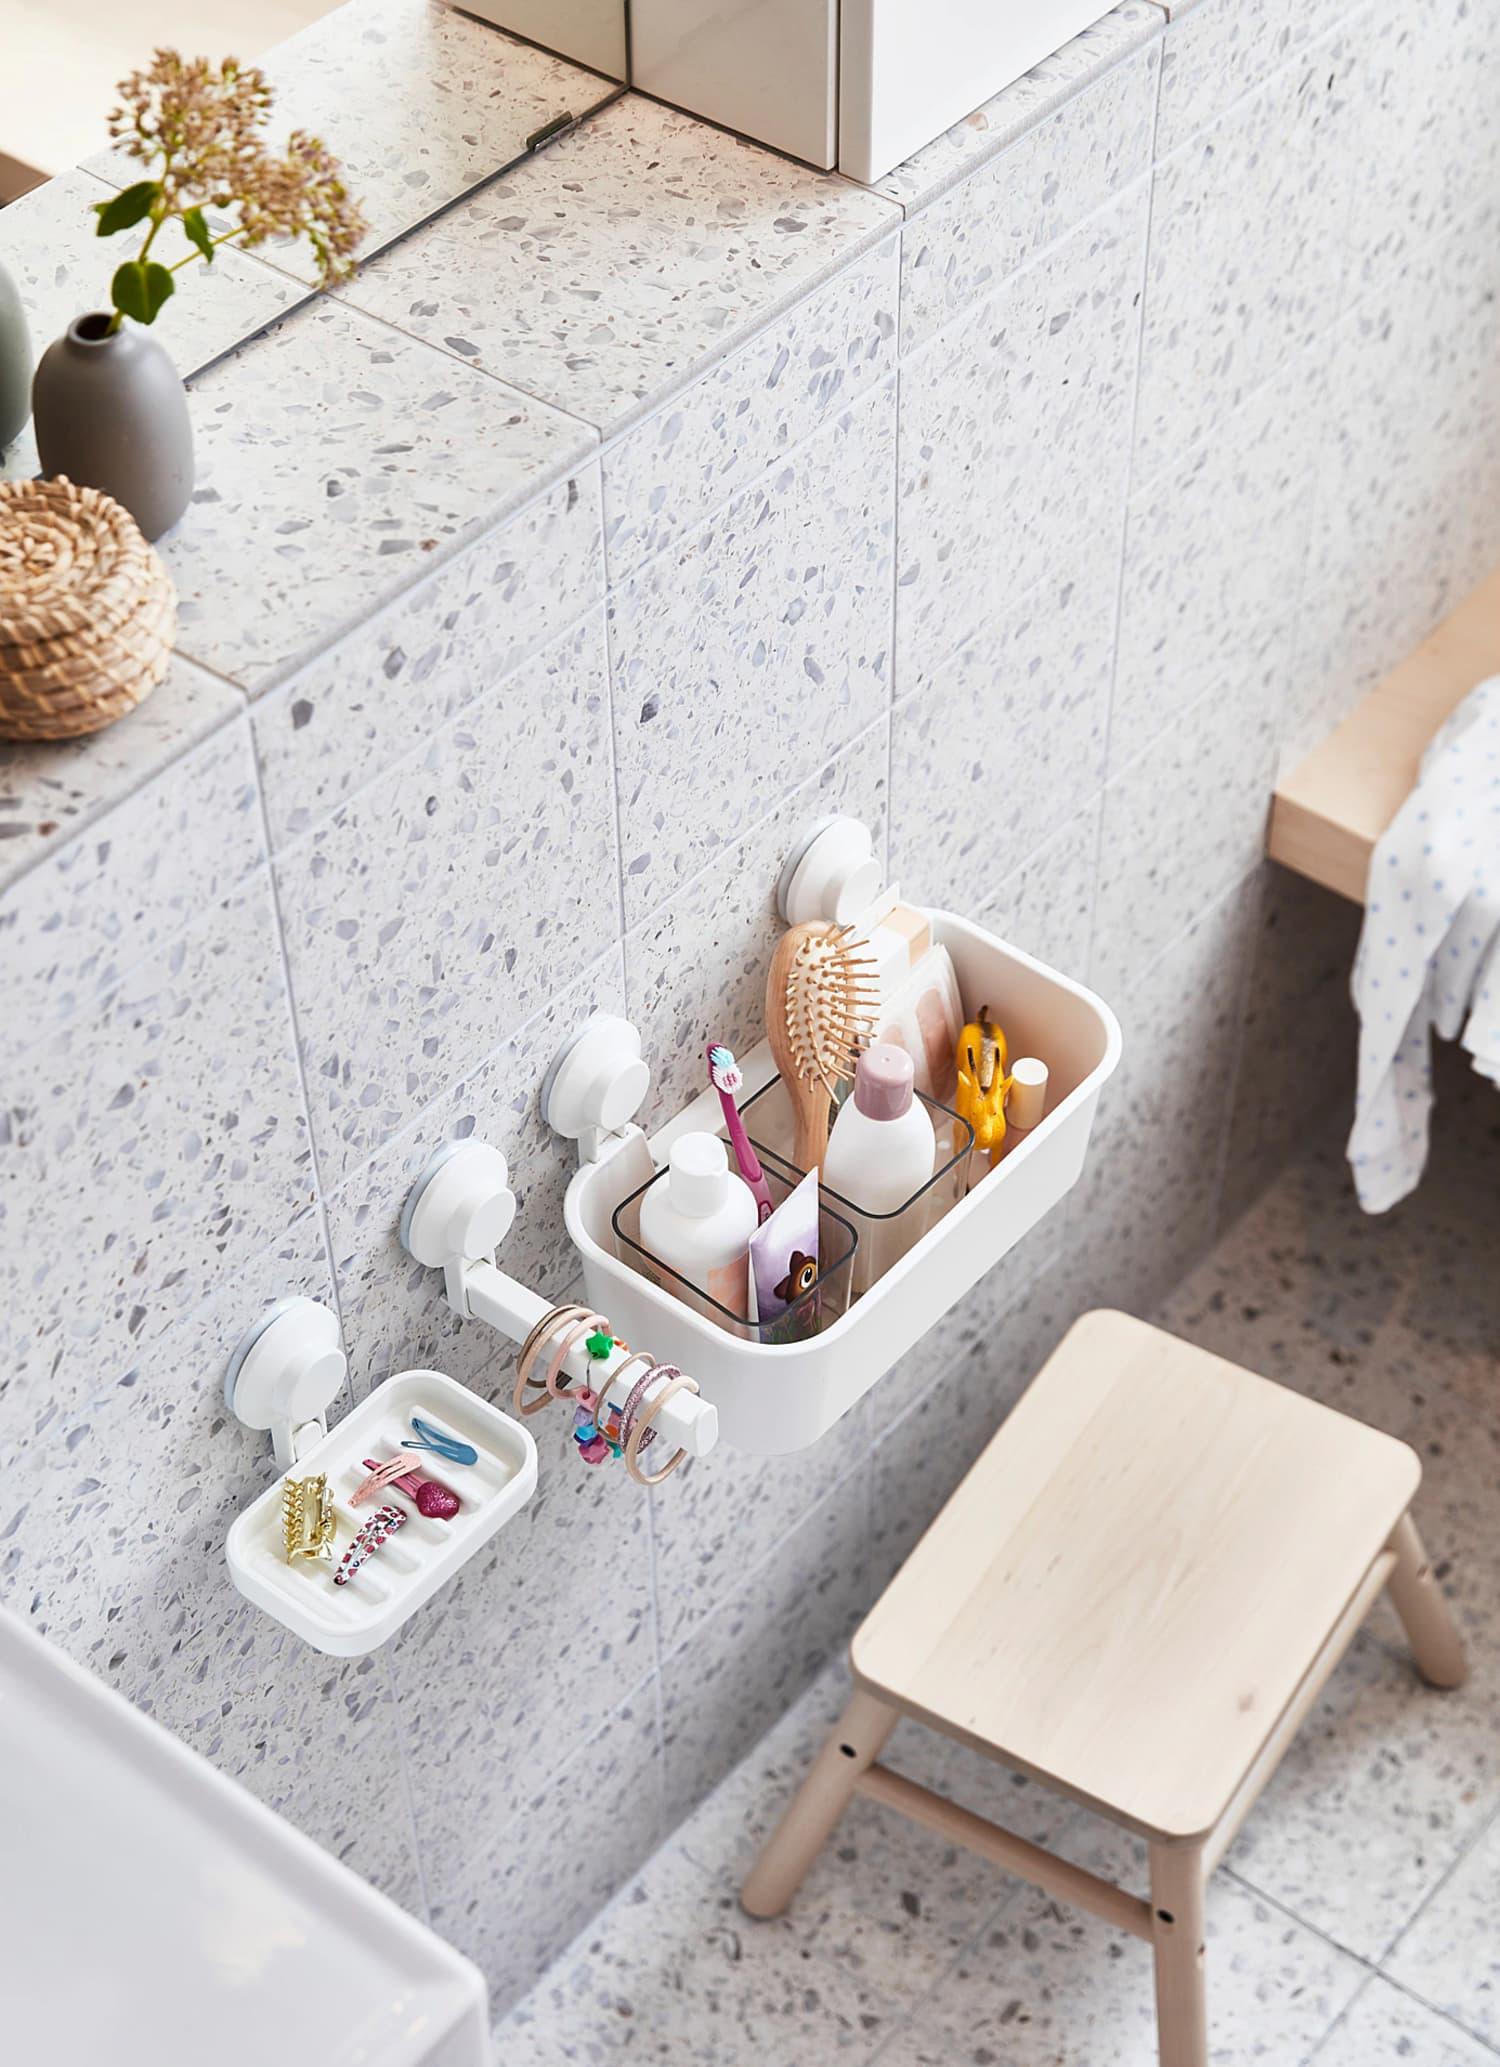 12 Drill-Free, Renter-Friendly Ways to Organize Your Bathroom